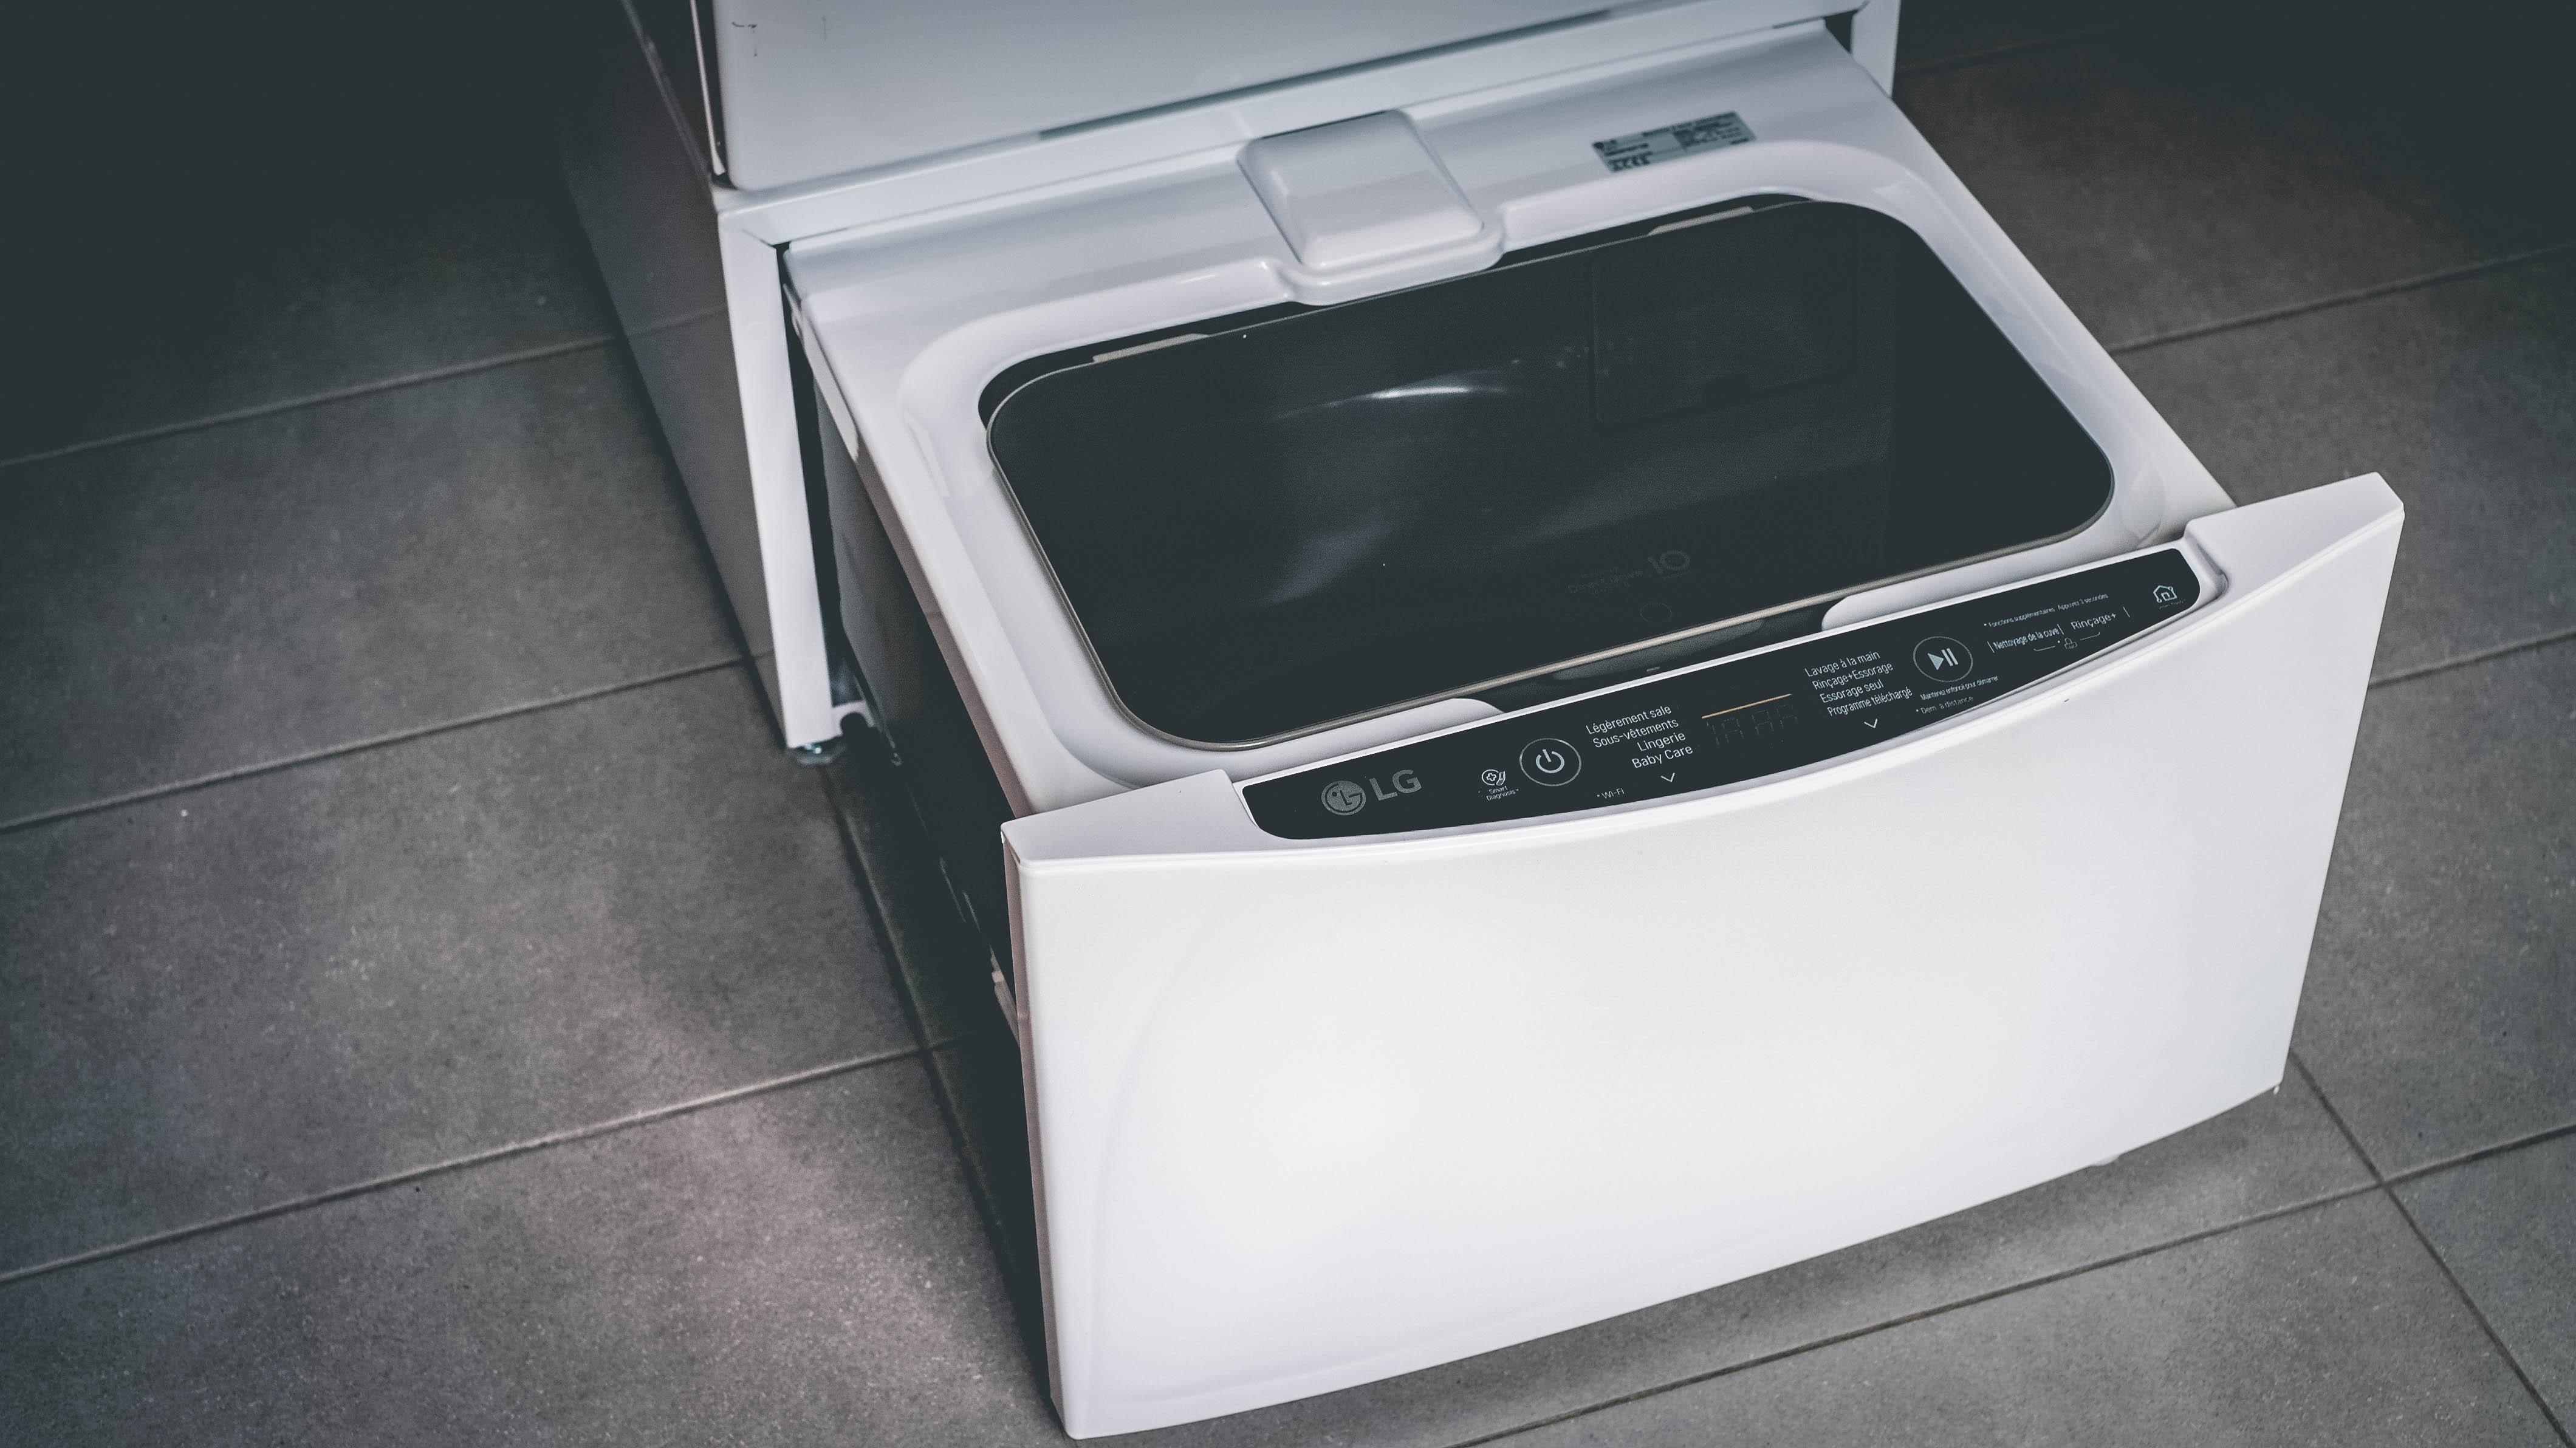 le lg twinwash la machine lavante s chante de demain nathanyel bns blog masculin. Black Bedroom Furniture Sets. Home Design Ideas